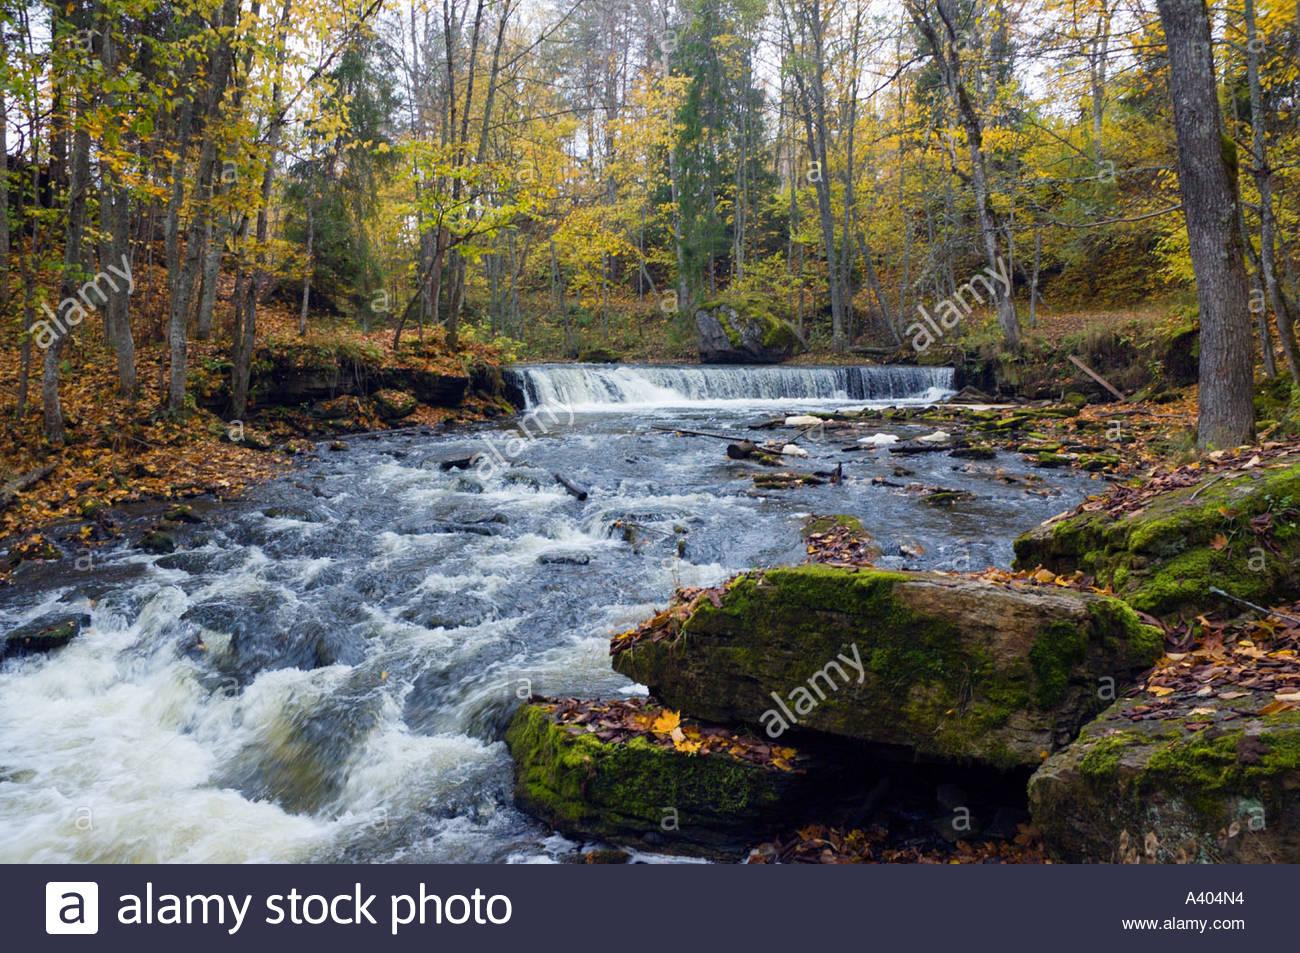 Europe eu estonia lahemaa national park nommeveski n mmeveski waterfall river valgejogi valgej gi autumn